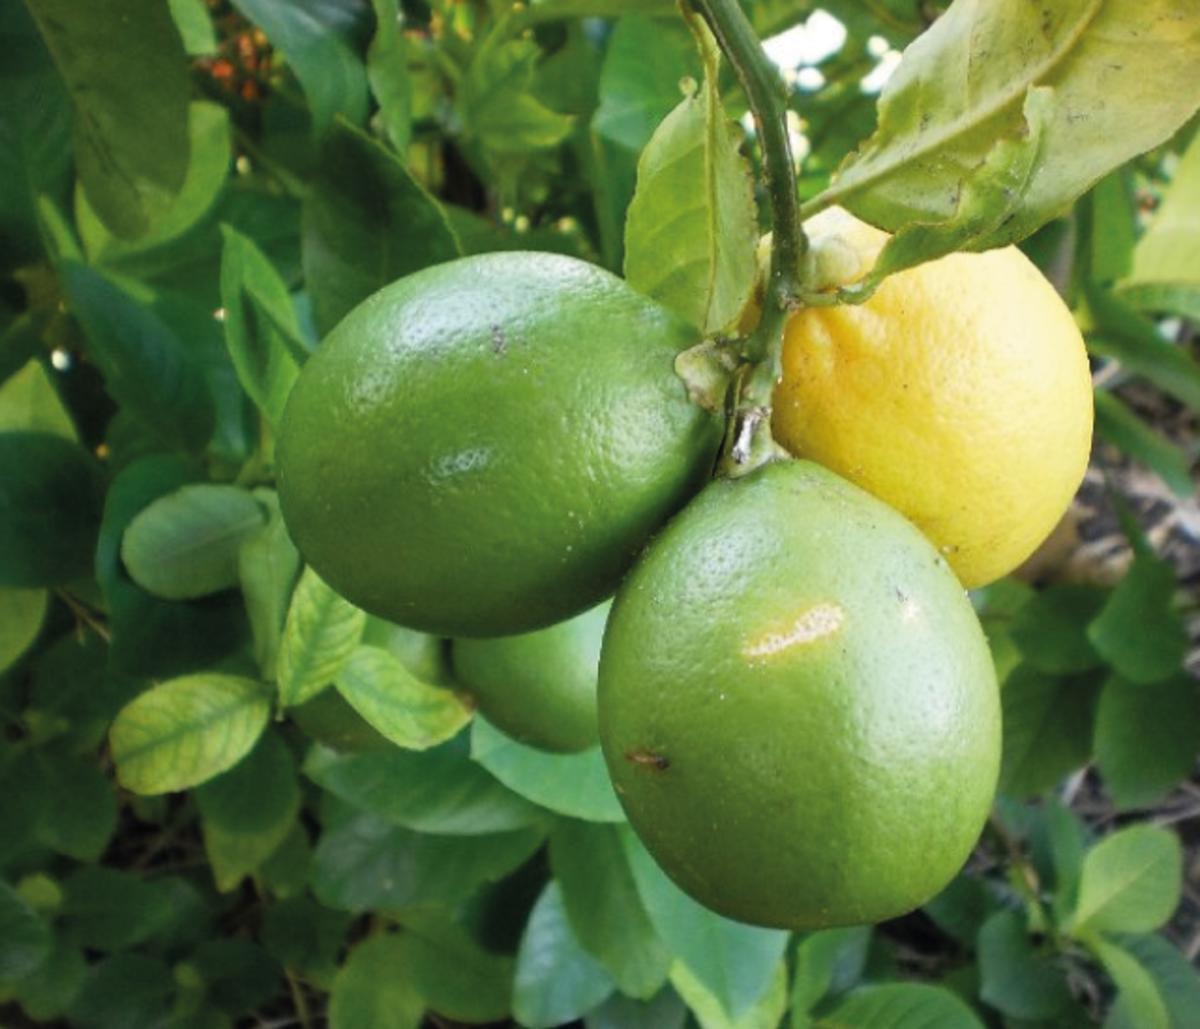 Galician Lemon